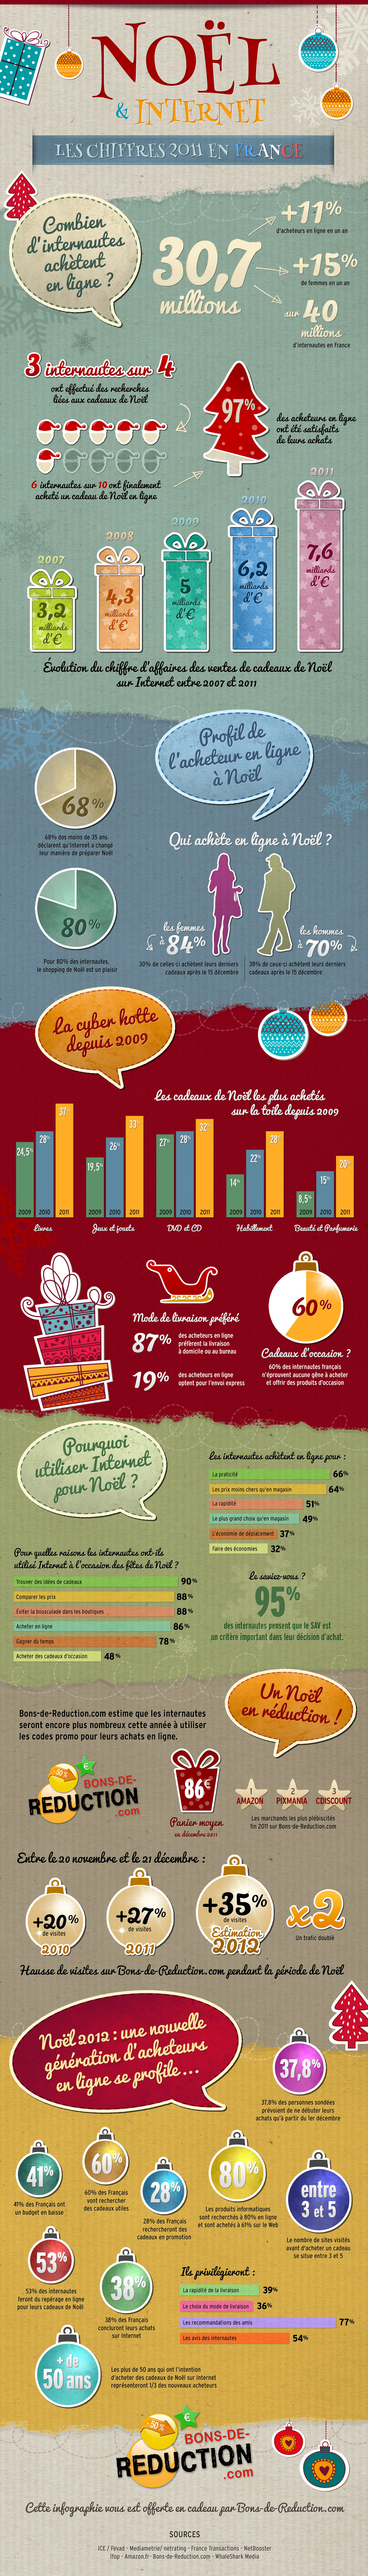 infographie_noel_ecommerce_2011